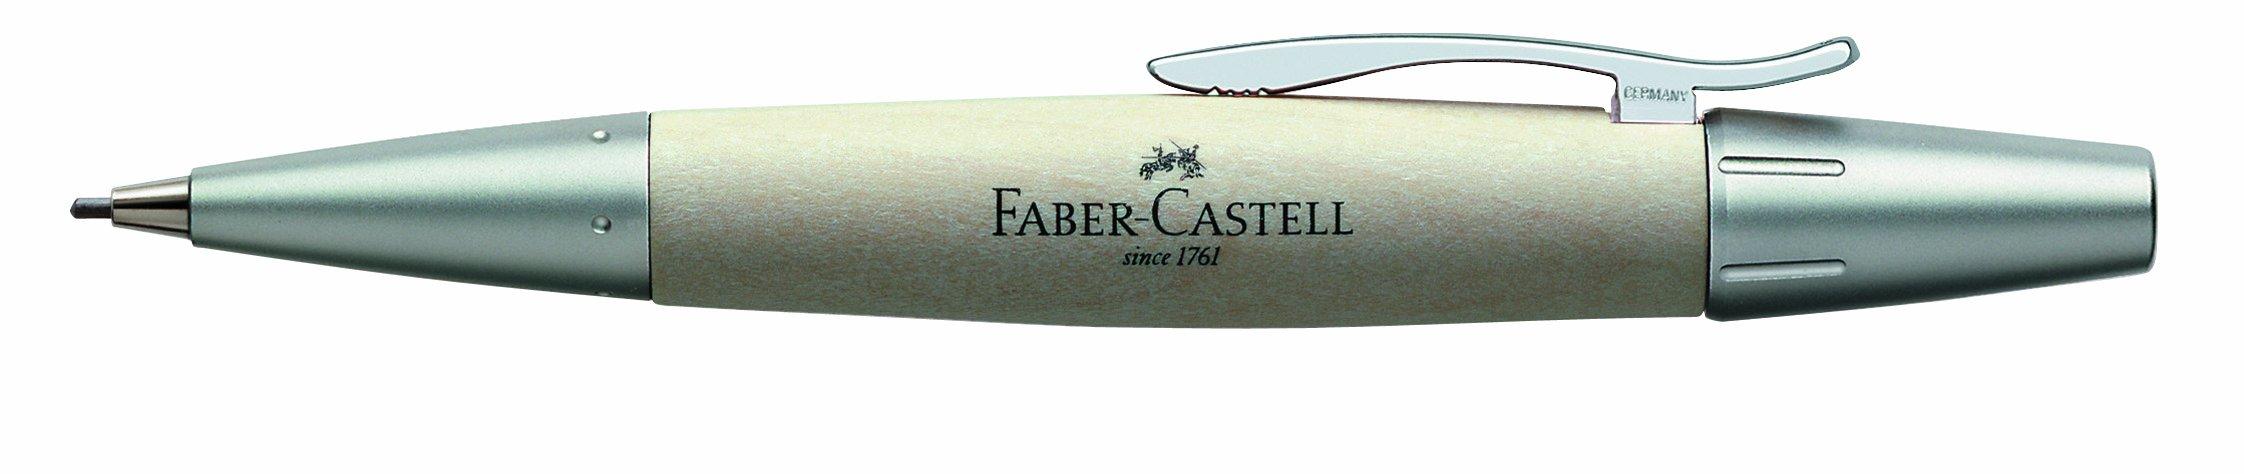 Faber-Castell Design E-Motion Pearwood Matte Light Maple Mechanical Pencil 138332